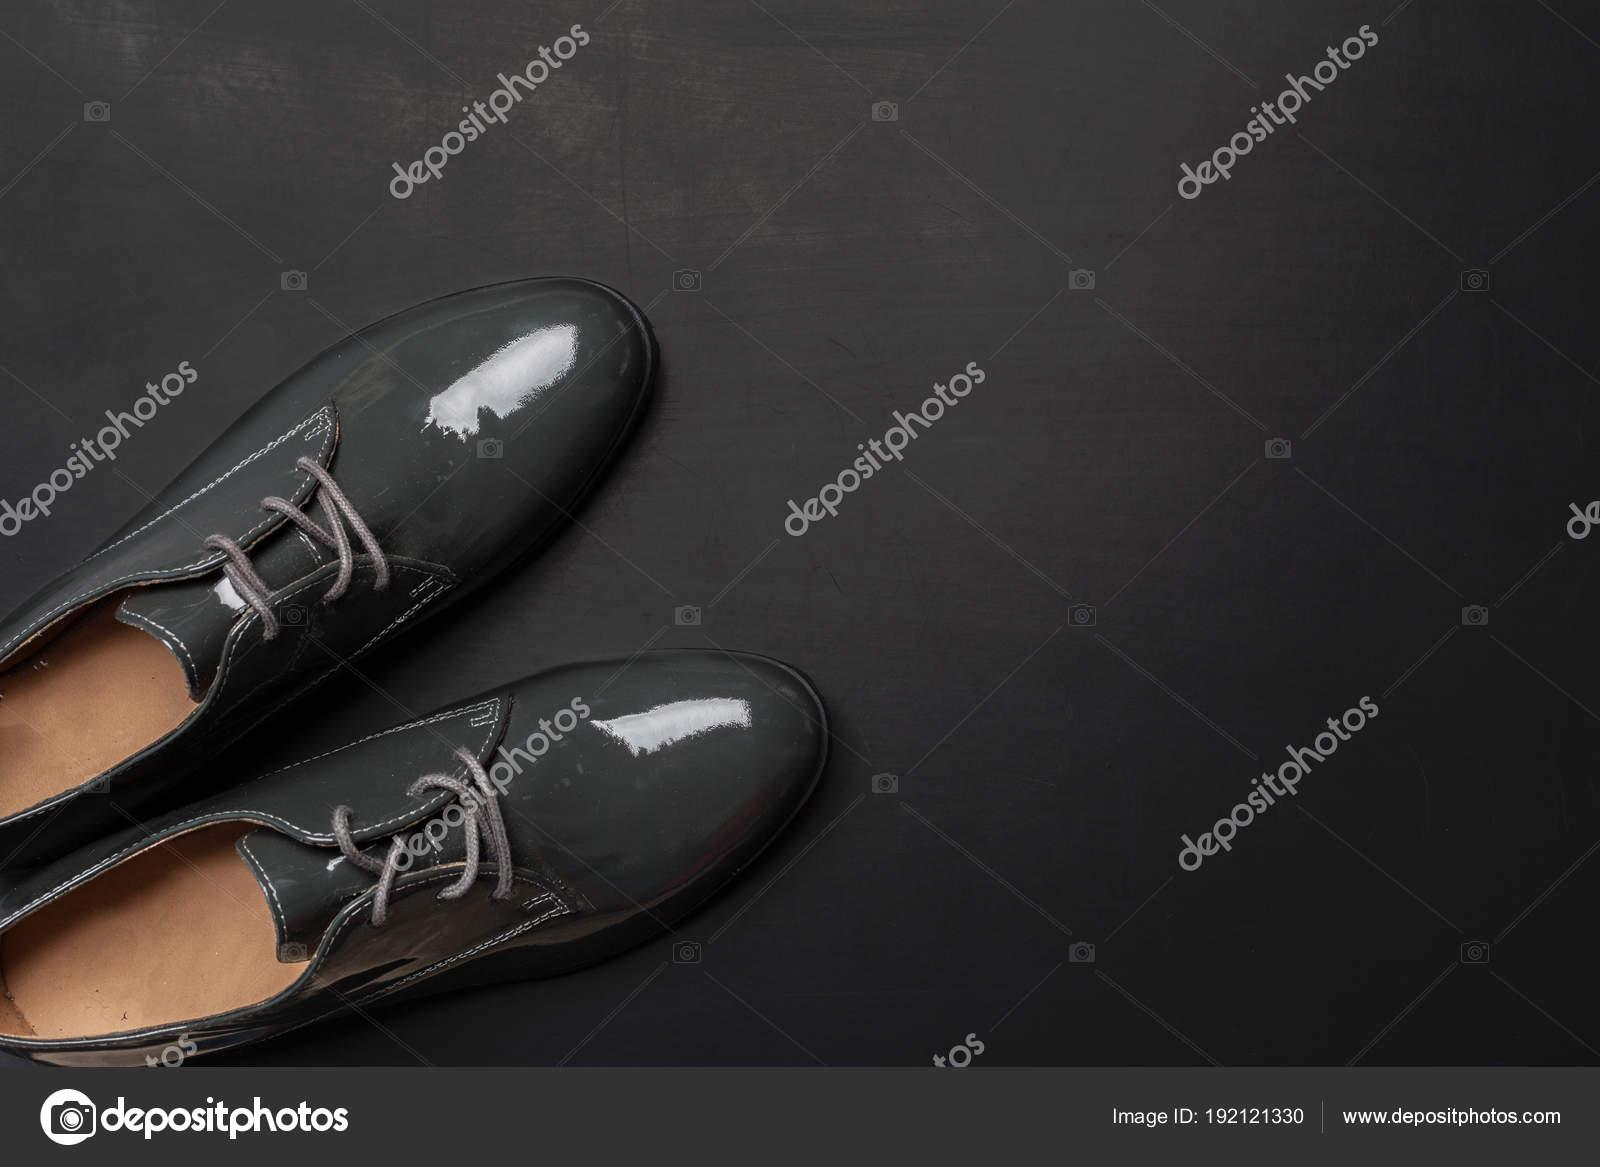 c002c24496 Παπούτσια Γυναικών Ξύλινα Φόντο — Φωτογραφία Αρχείου © Fotofabrika ...